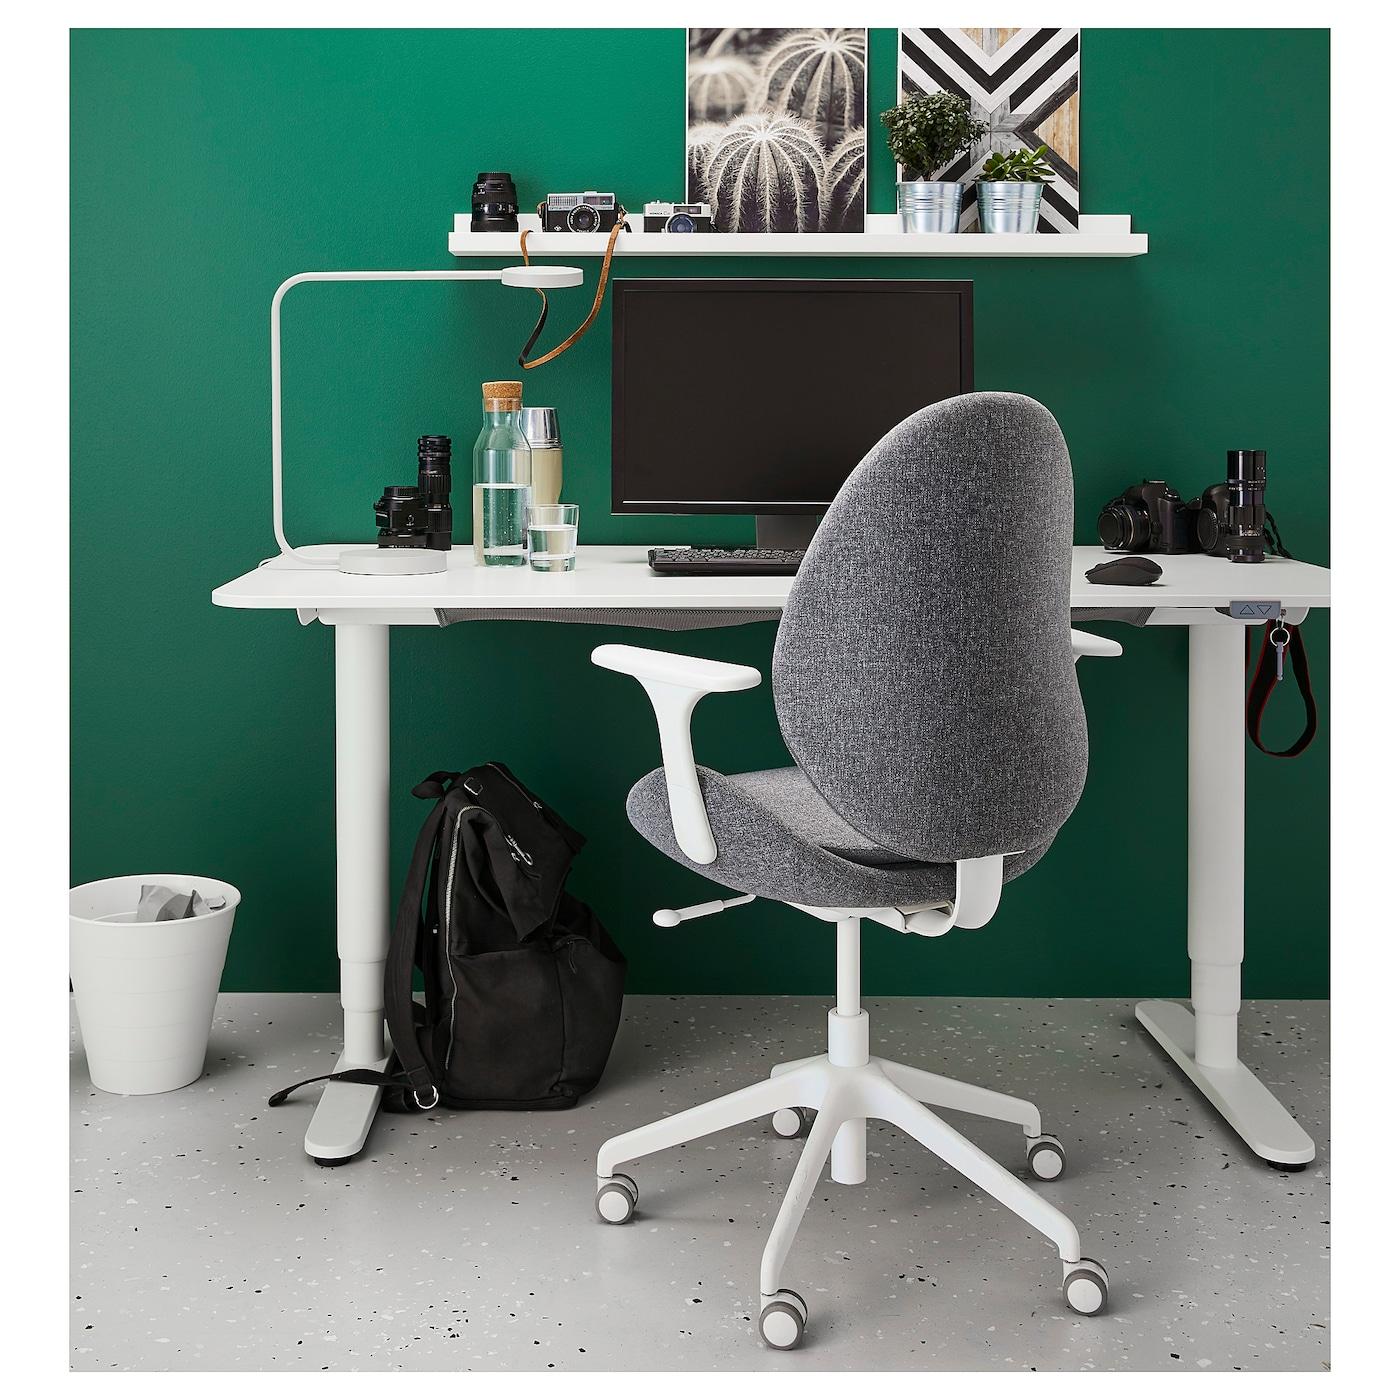 HATTEFJÄLL Office chair with armrests - Gunnared medium grey/white